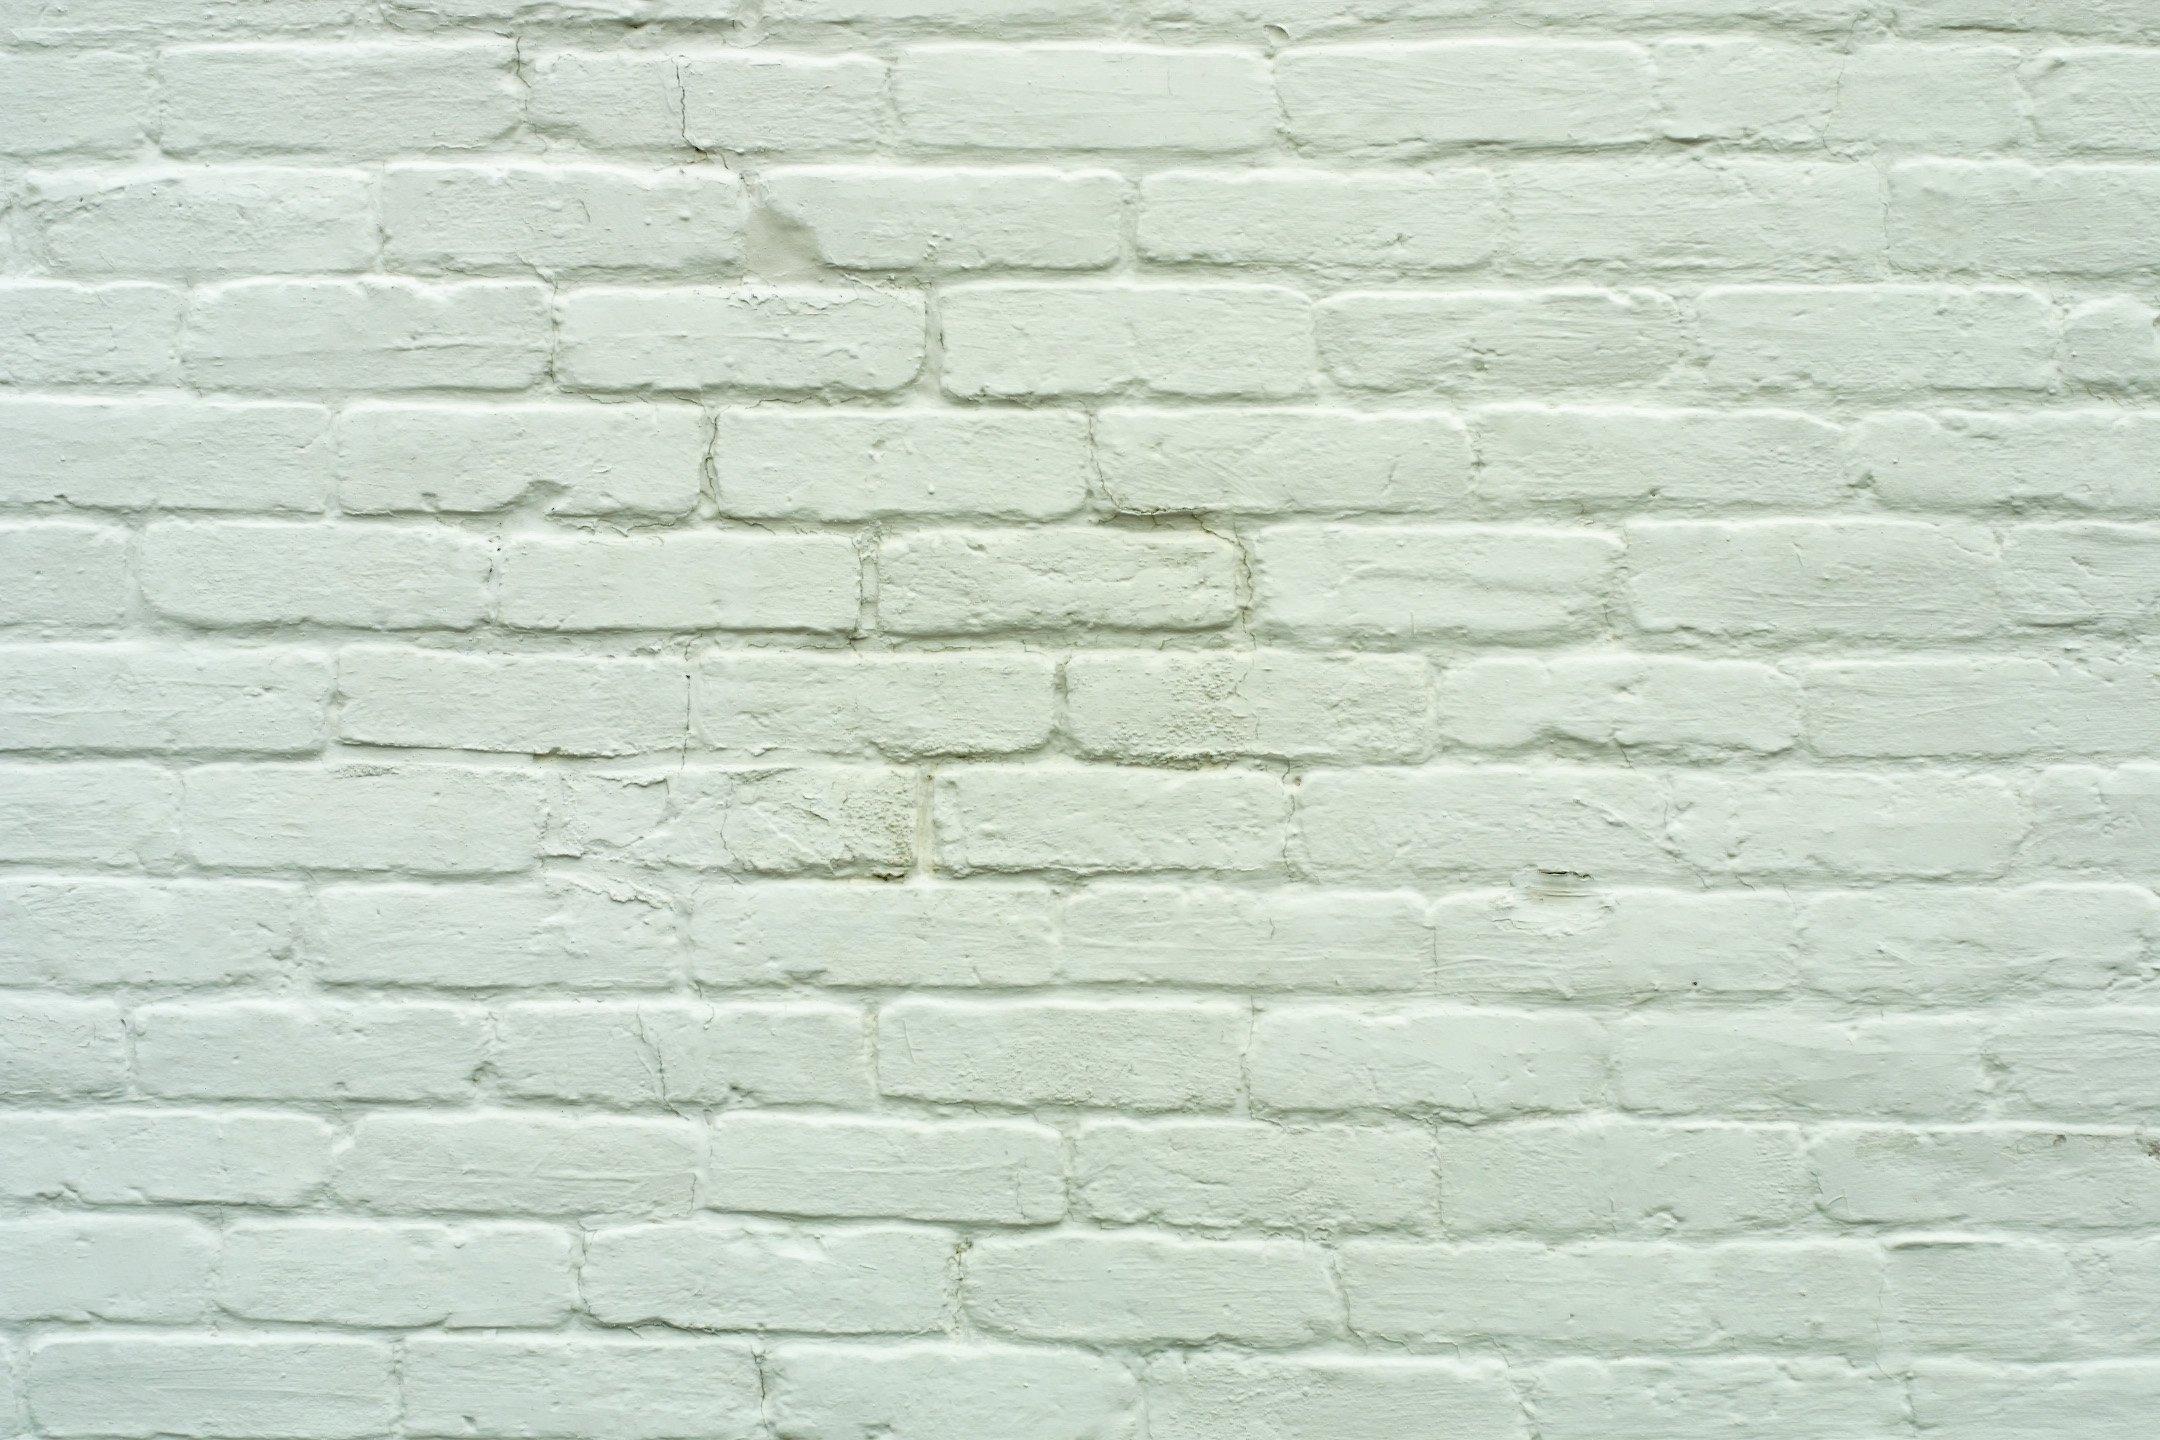 whitewall 00347 seamless white brick wall thumb5534648 white painted 2160x1440